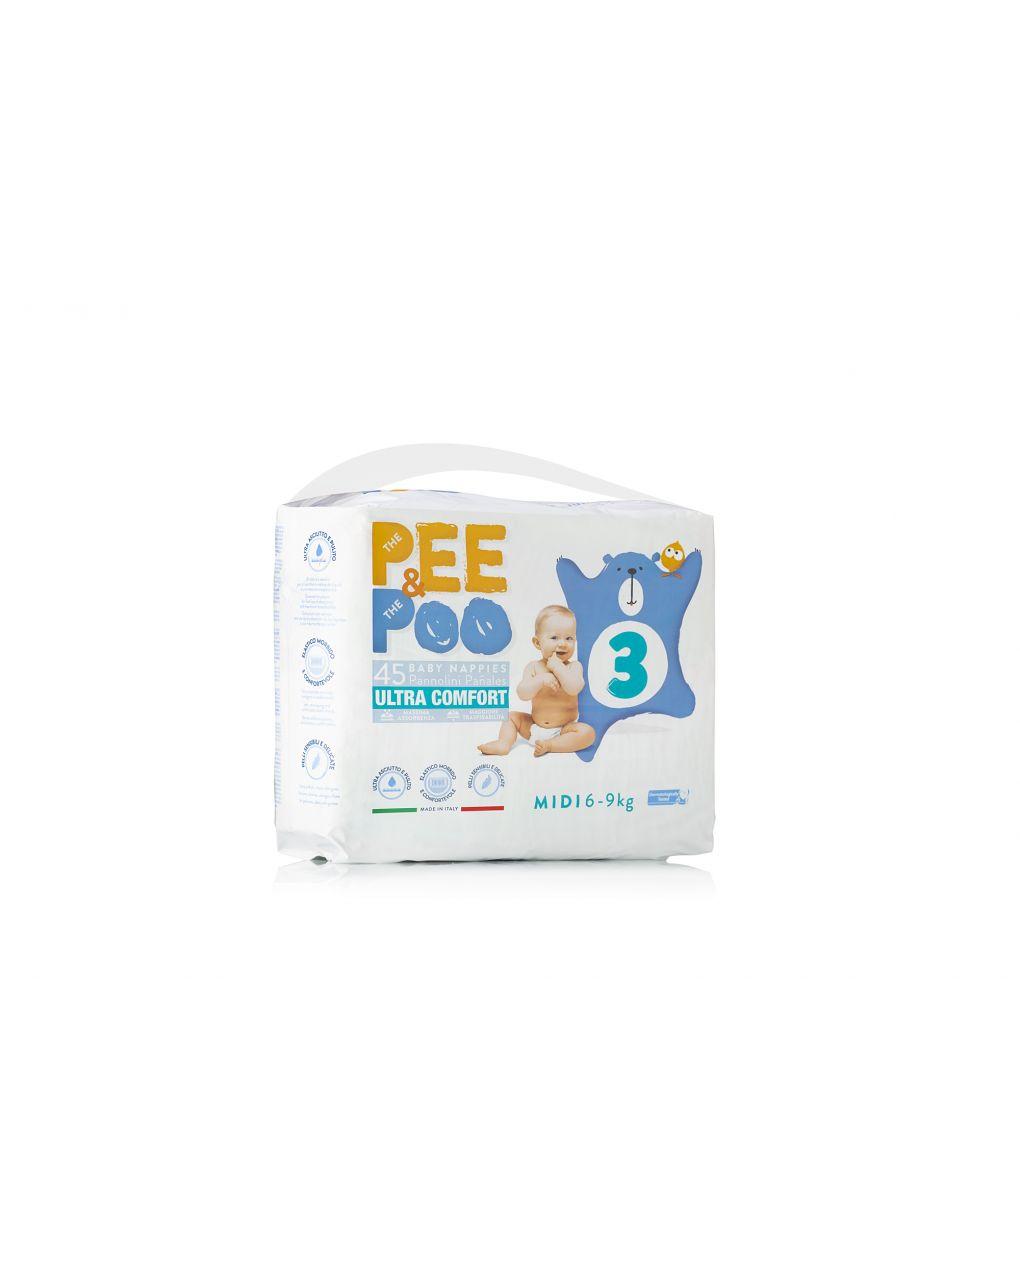 Pee&poo - midi tg 3 45 pz - The Pee & The Poo